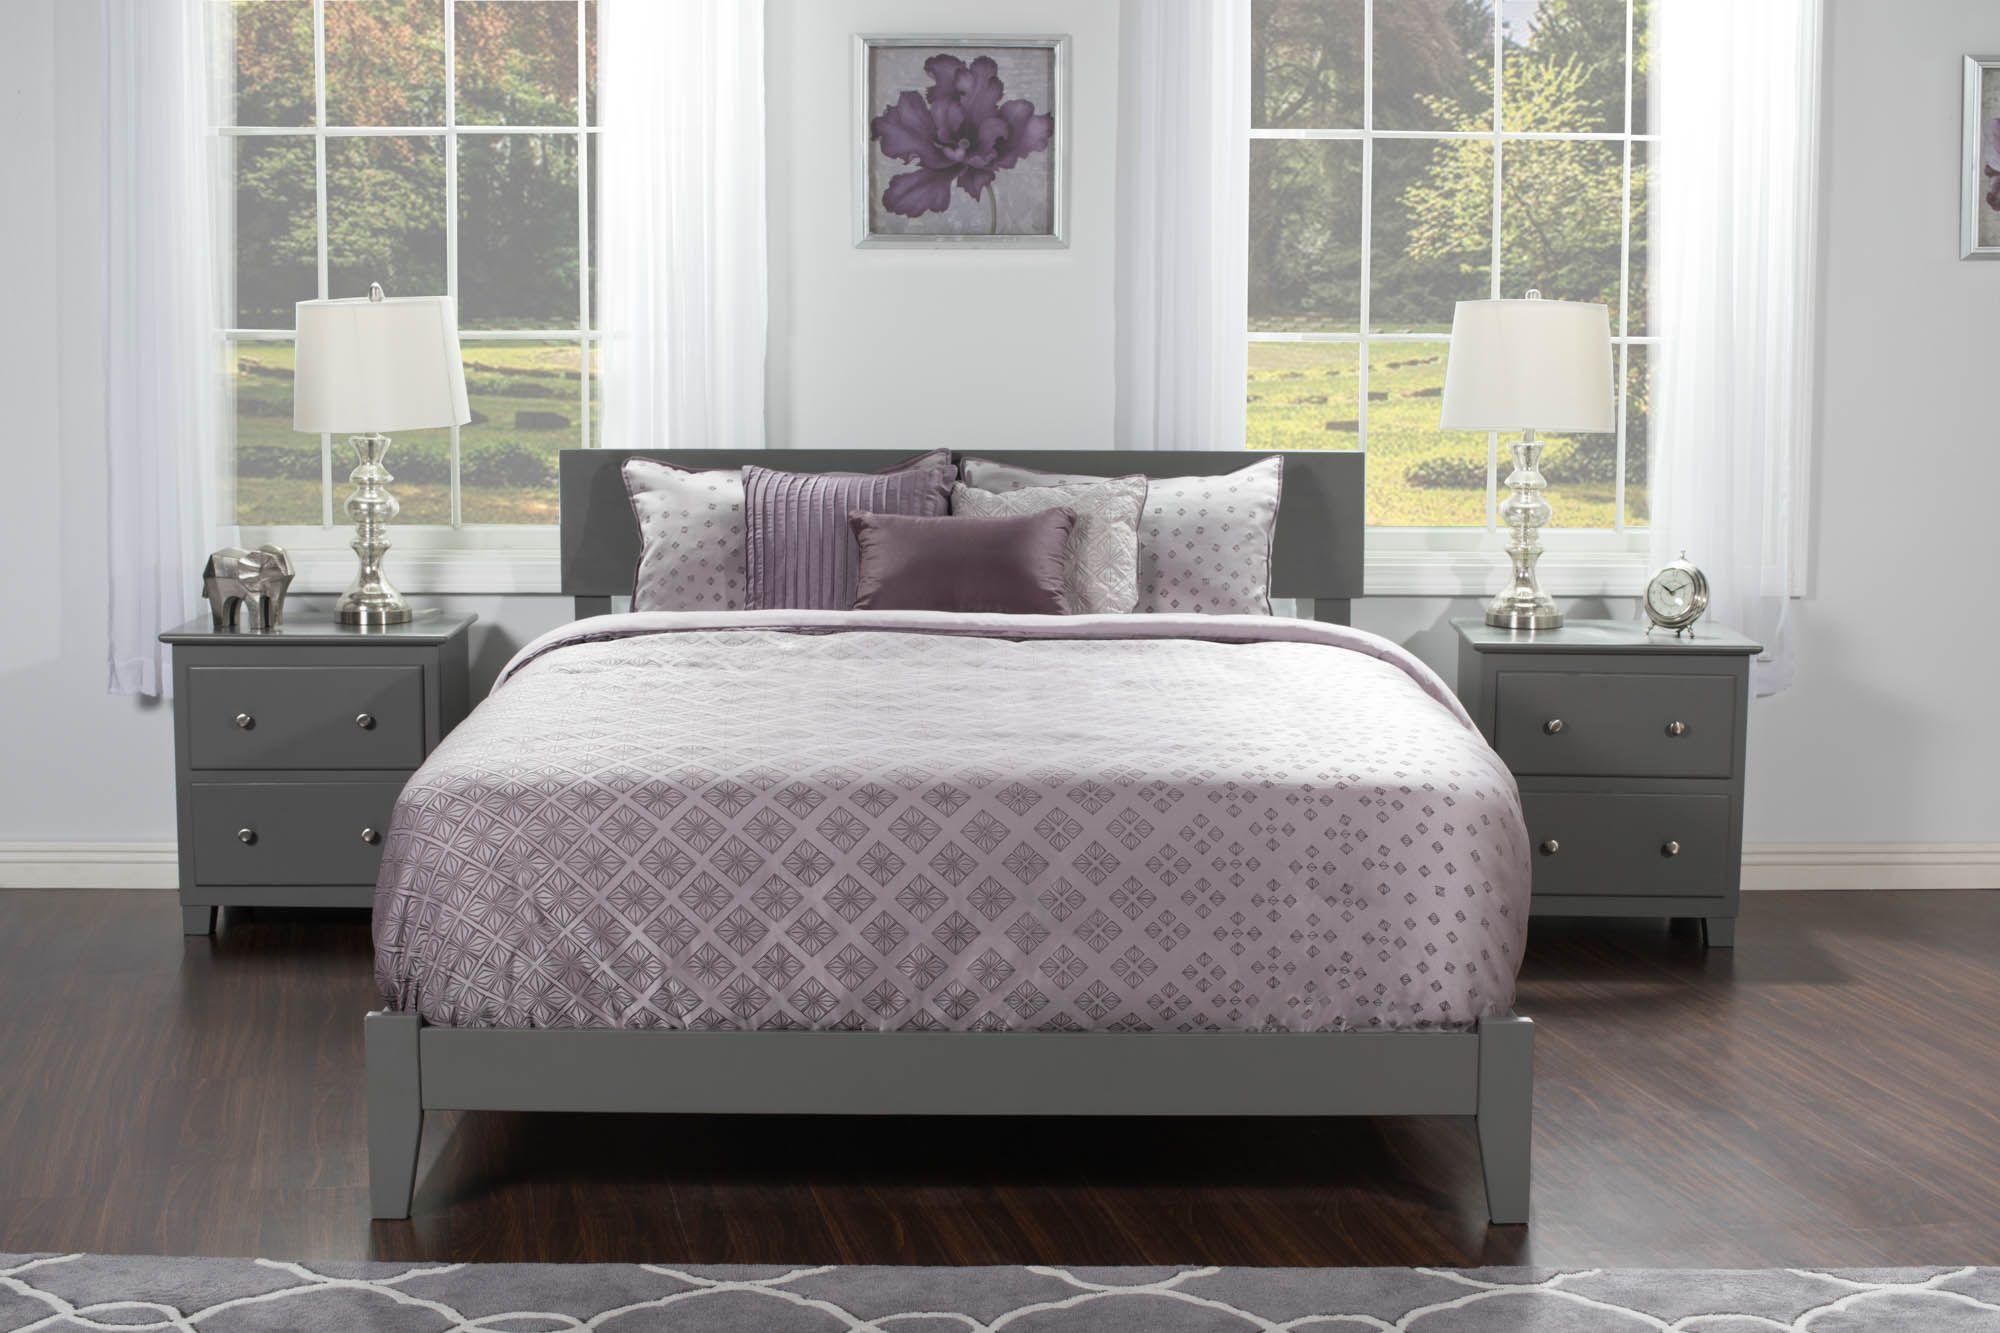 Orlando Traditional Bed Traditional Bed Atlantic Furniture King Platform Bed